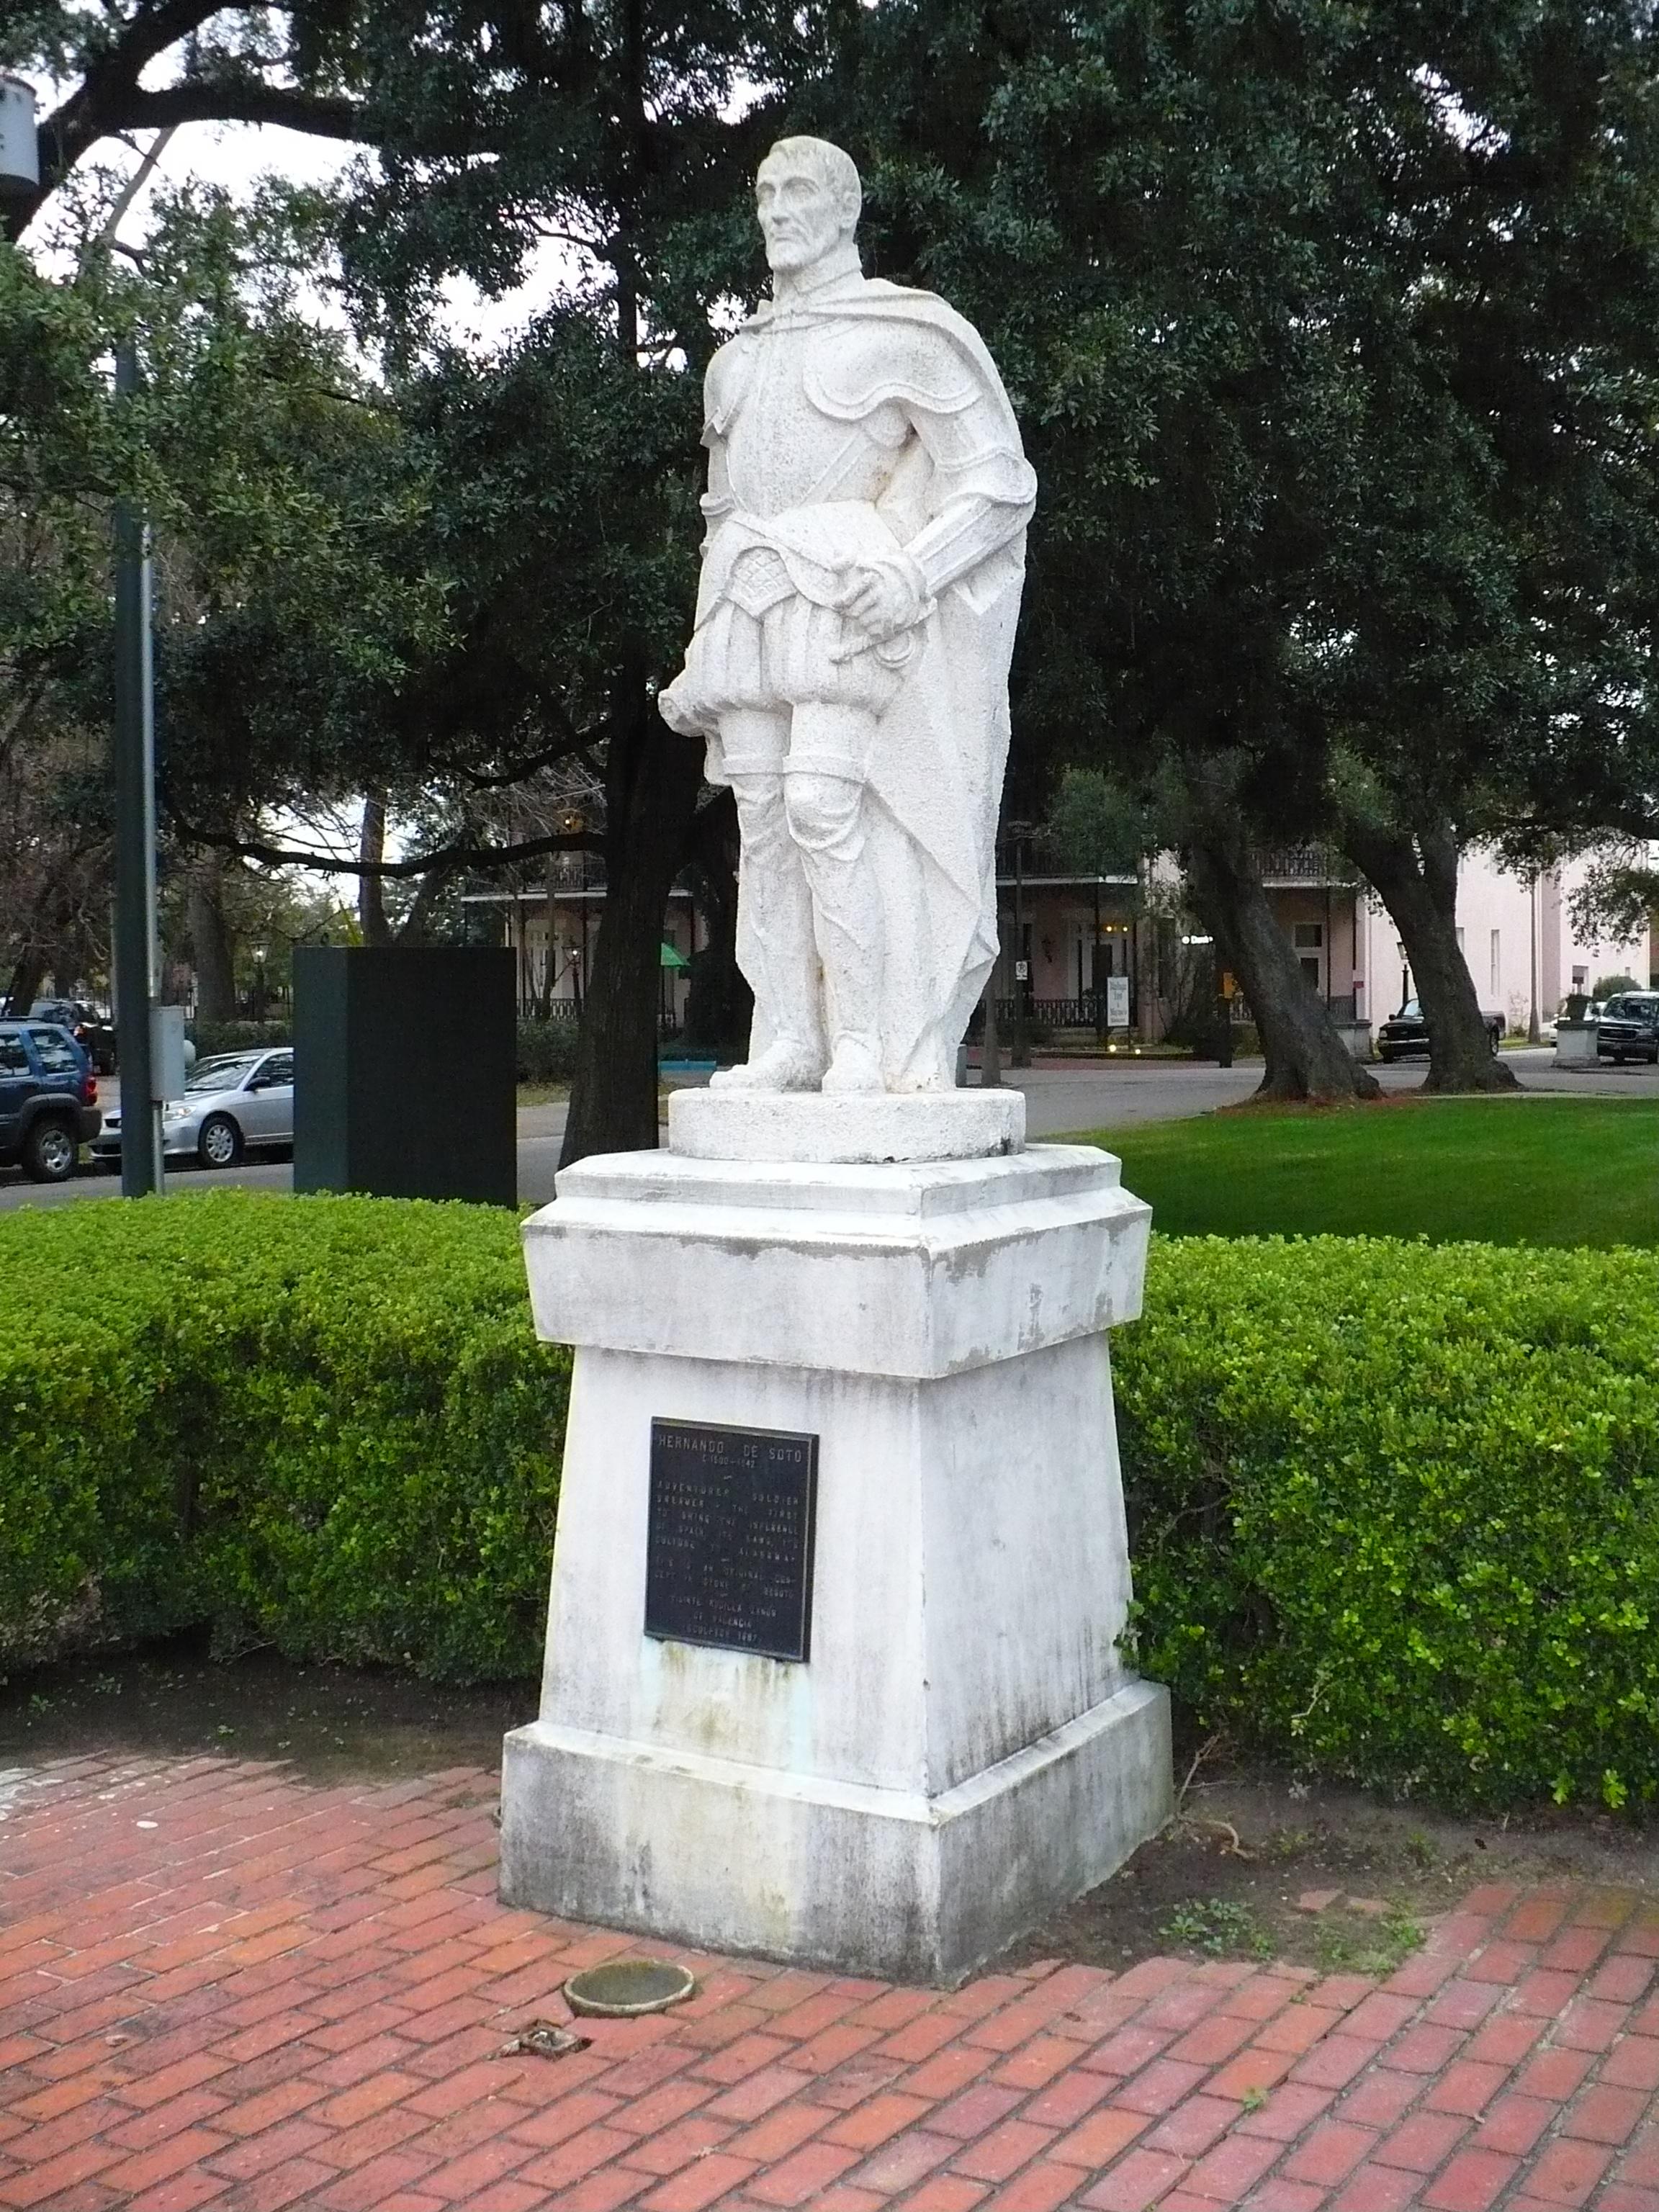 File:Statue of Hernando de Soto.JPG - Wikimedia Commons